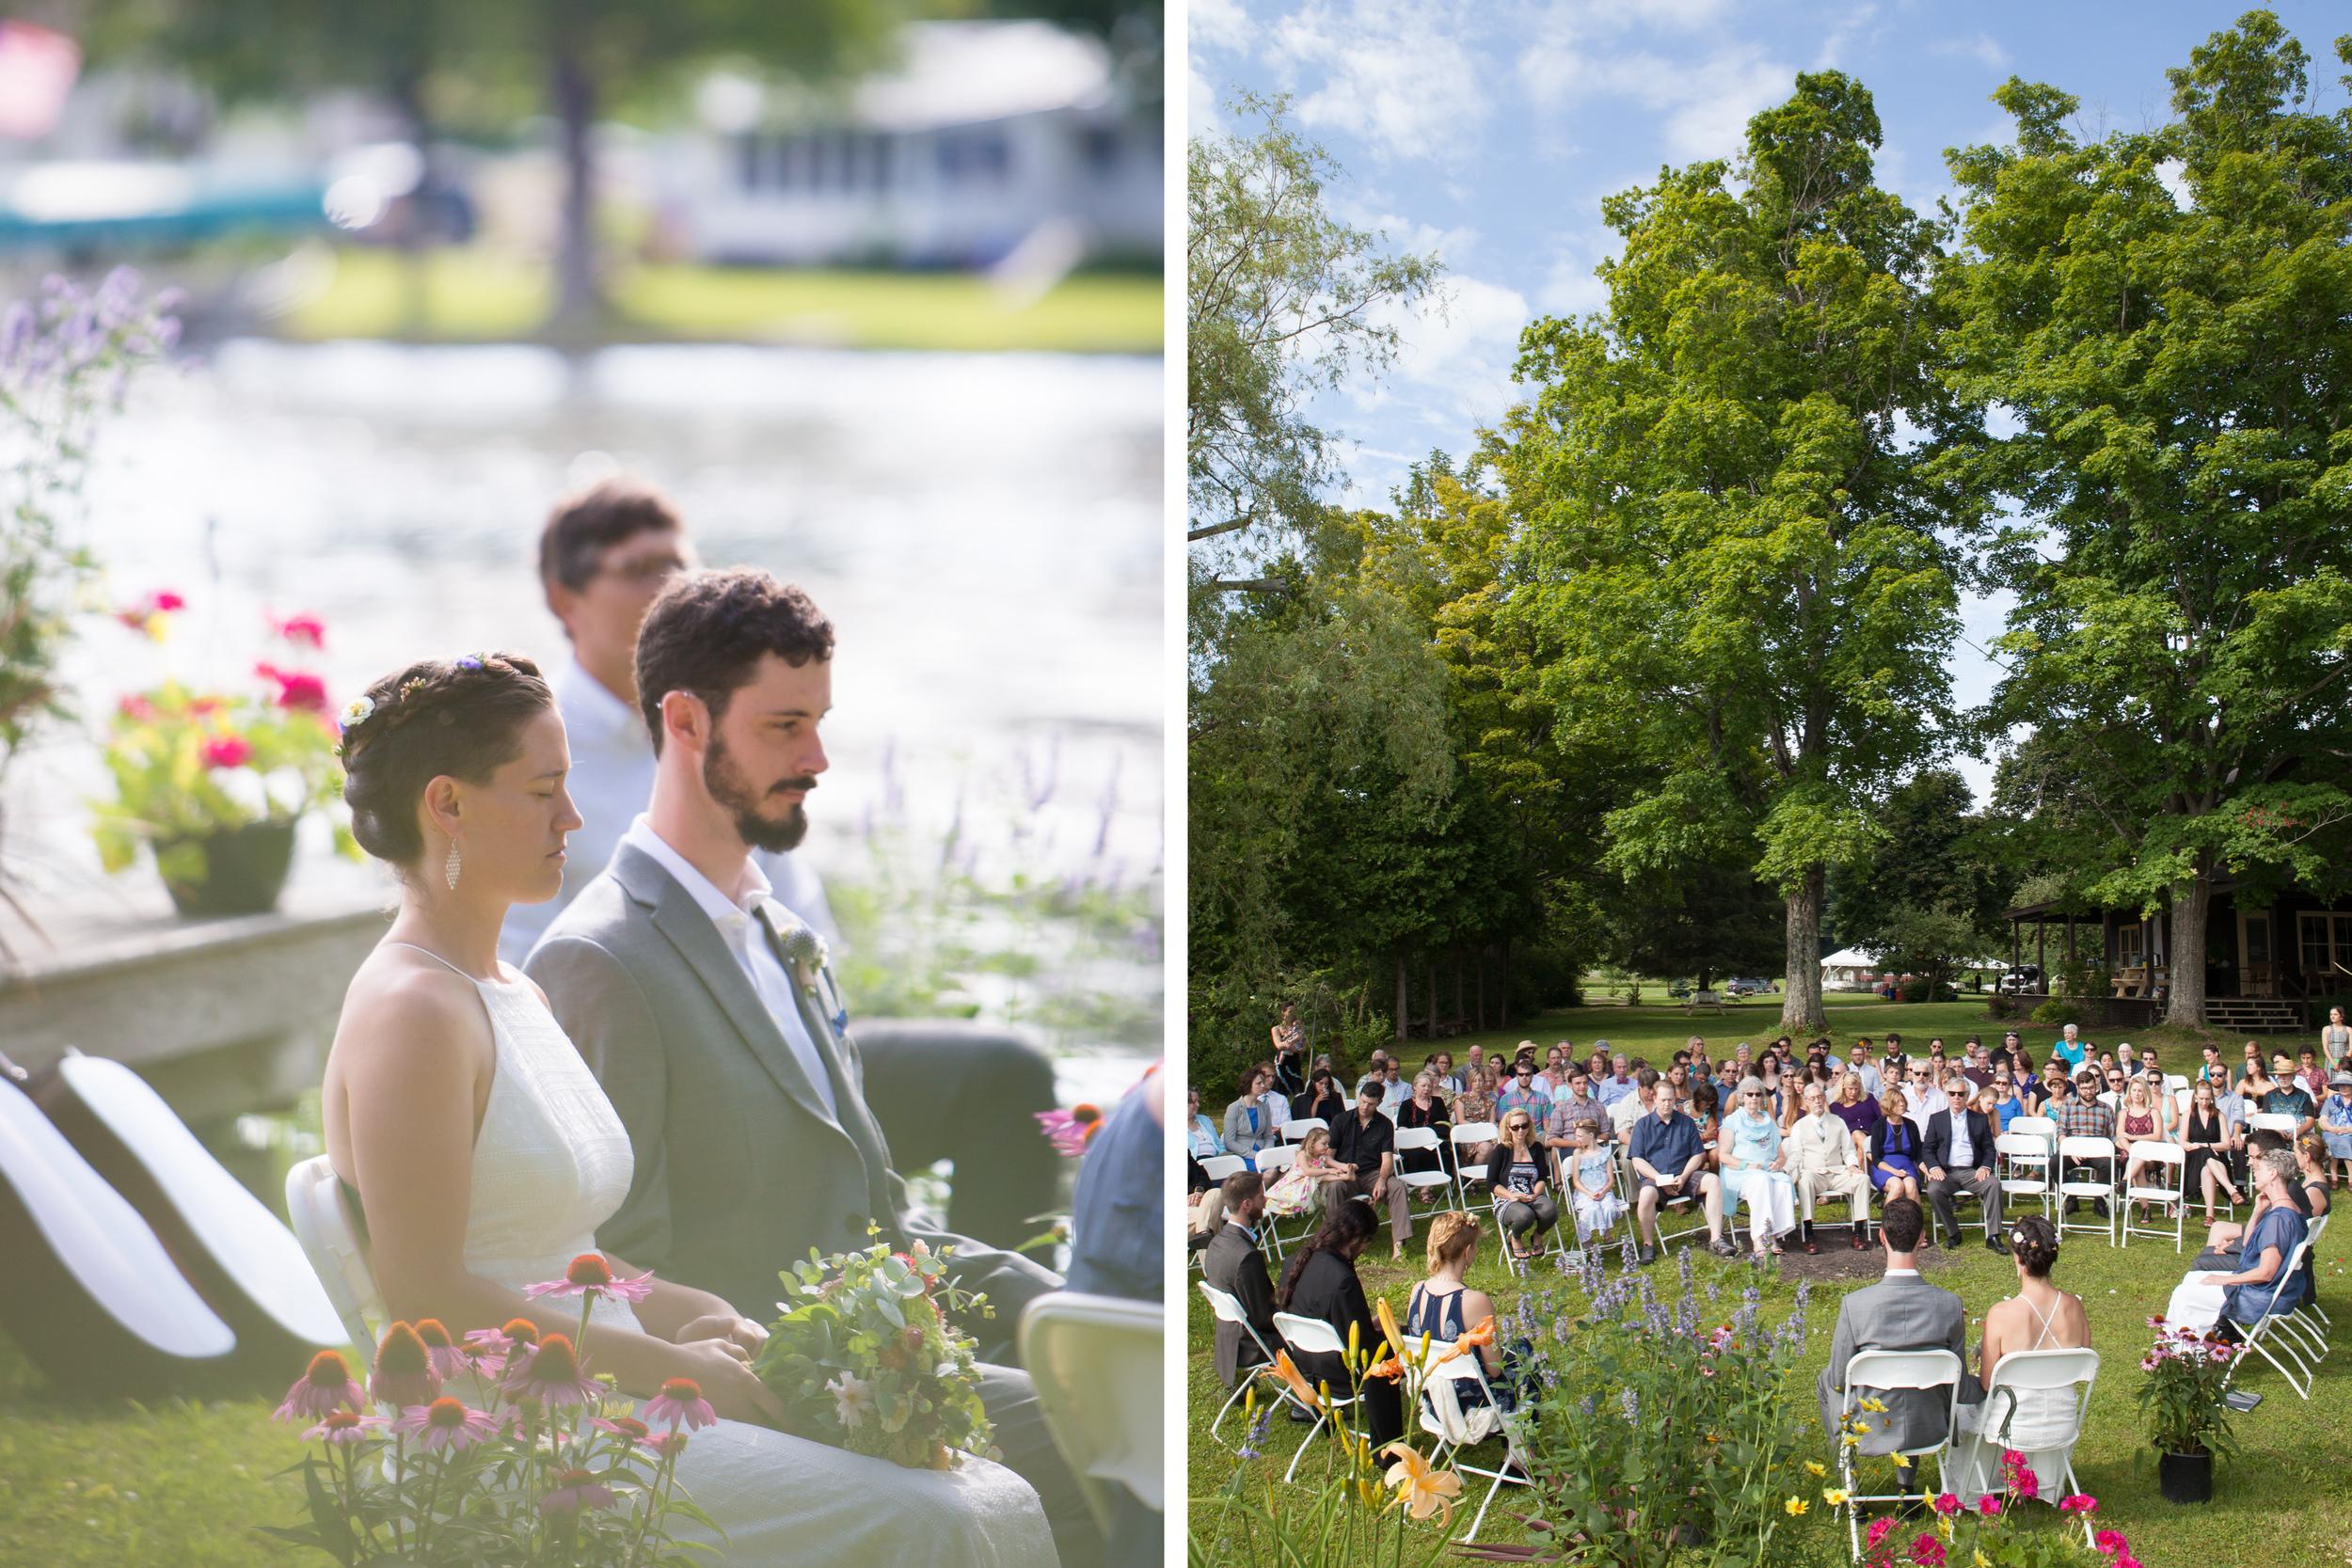 quaker-wedding-ceremony.jpg